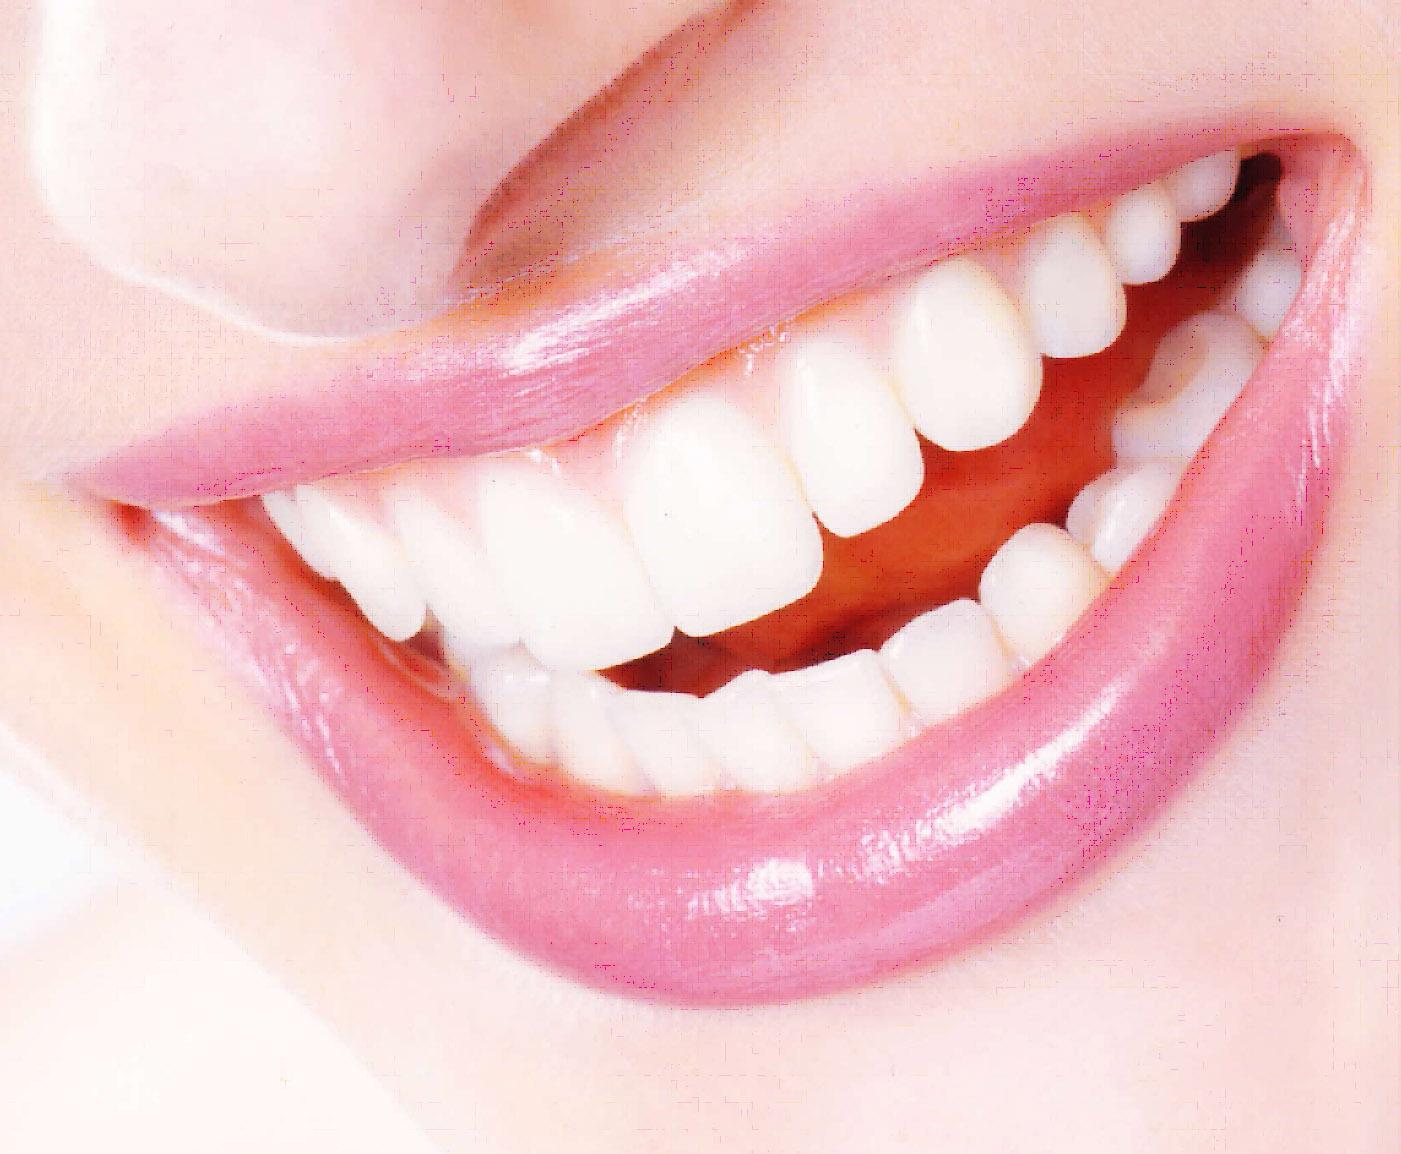 Lachender Mund rosa Lippen